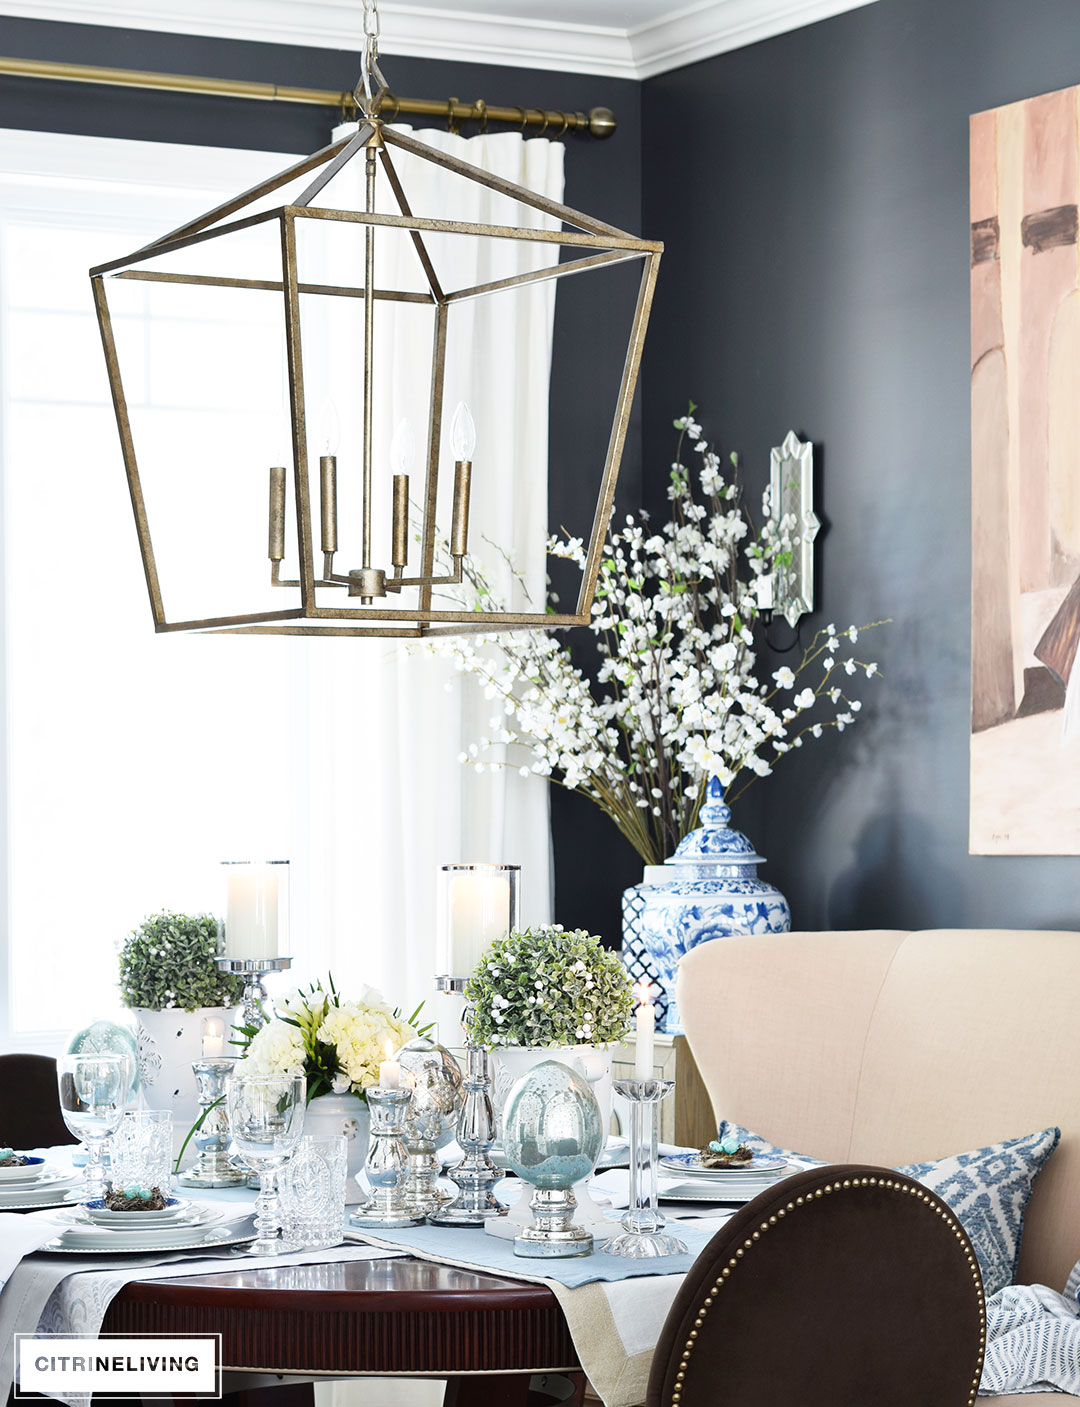 Modern, lantern style pendant chandelier hangs over an elegant Easter tablescape.